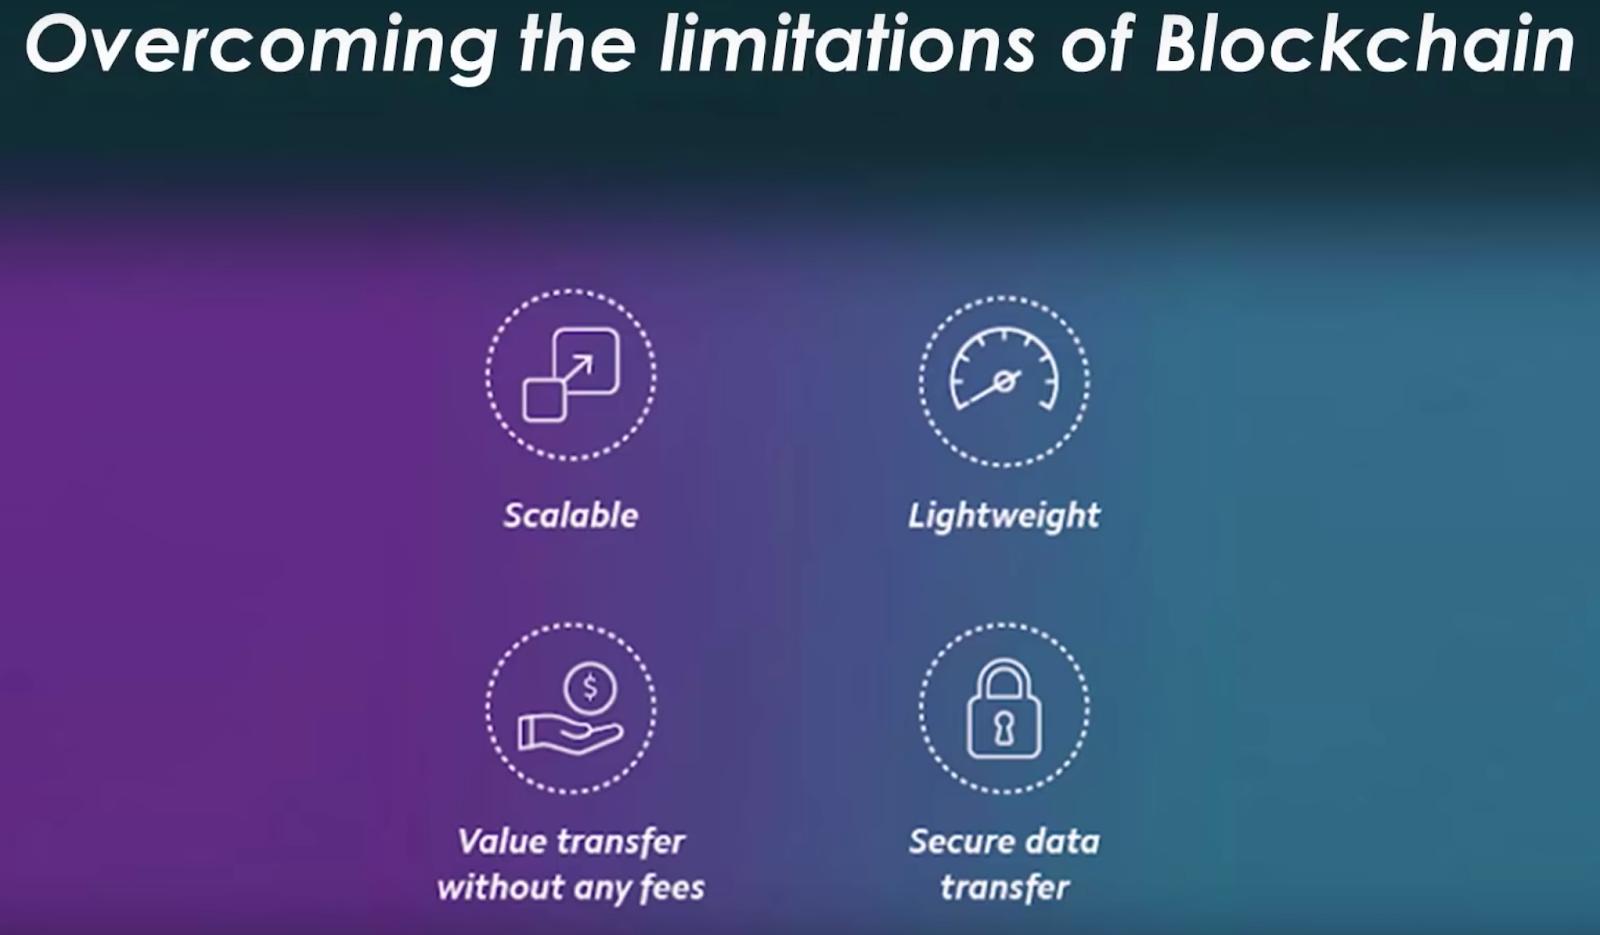 Overcoming the limitations of Blockchain